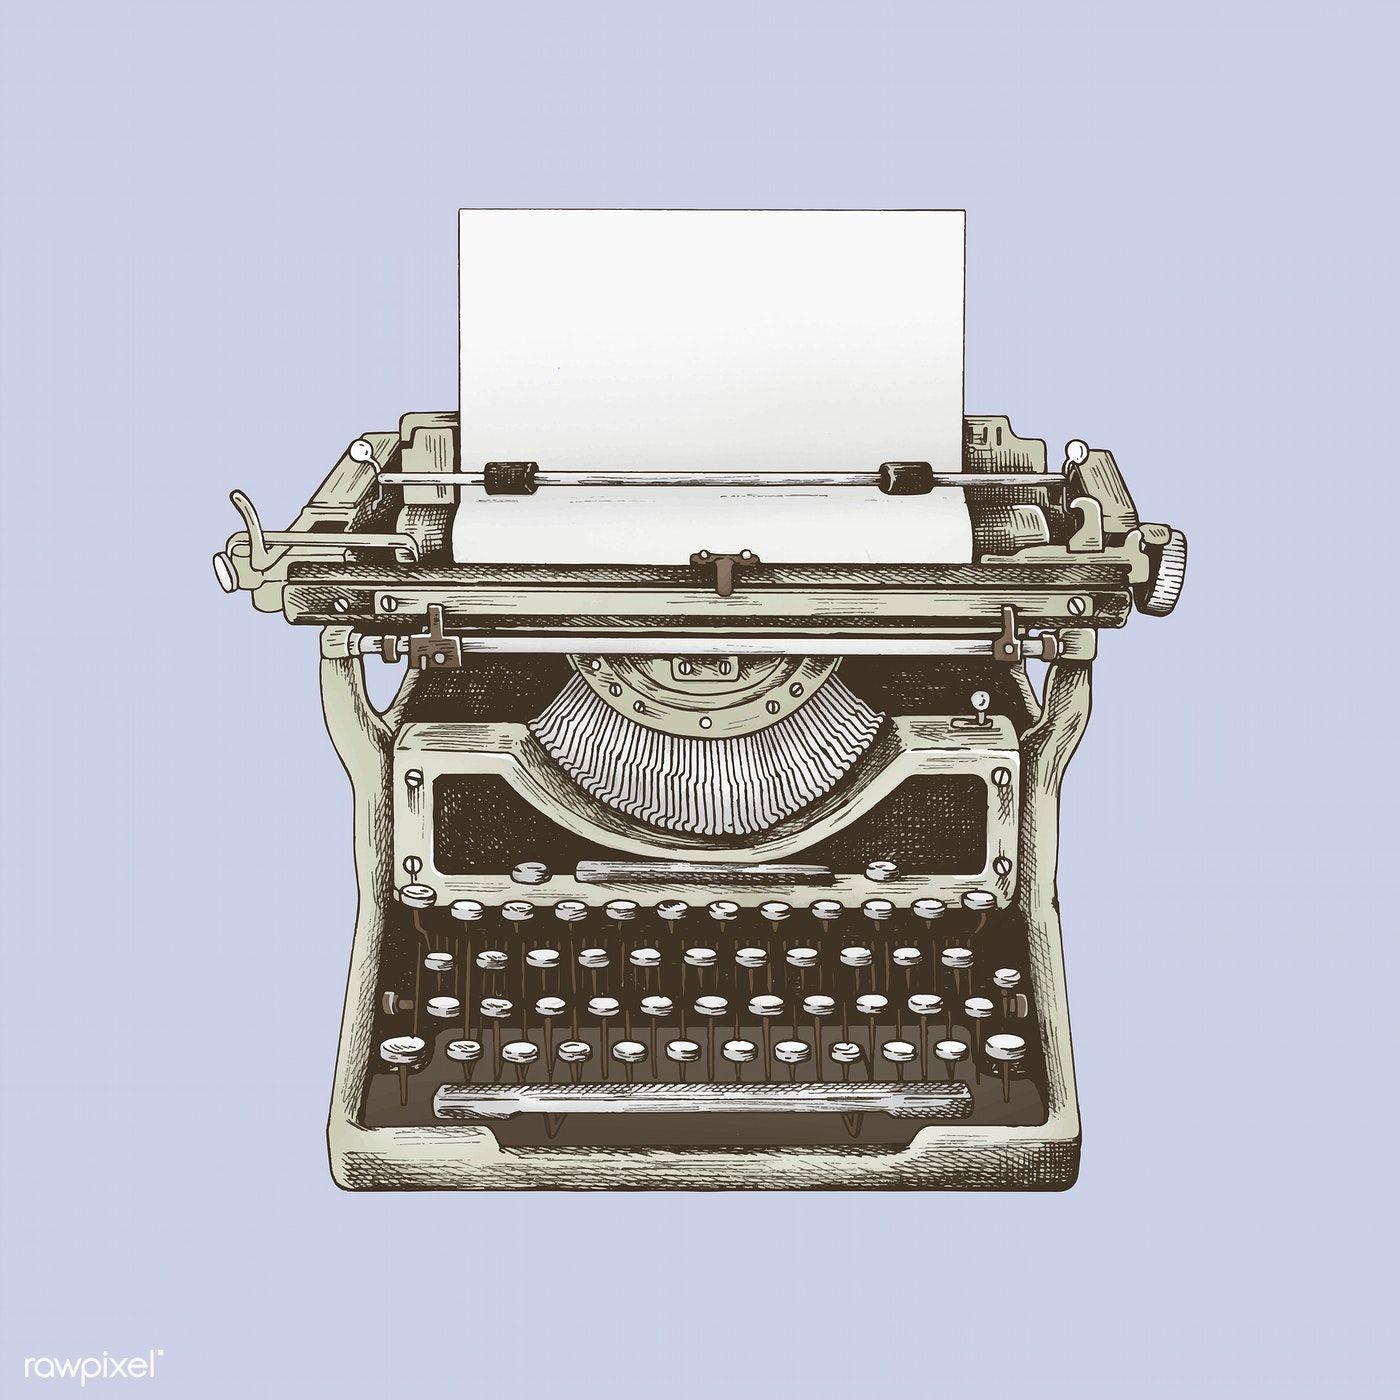 Download premium vector of Vintage mechanical typewriter